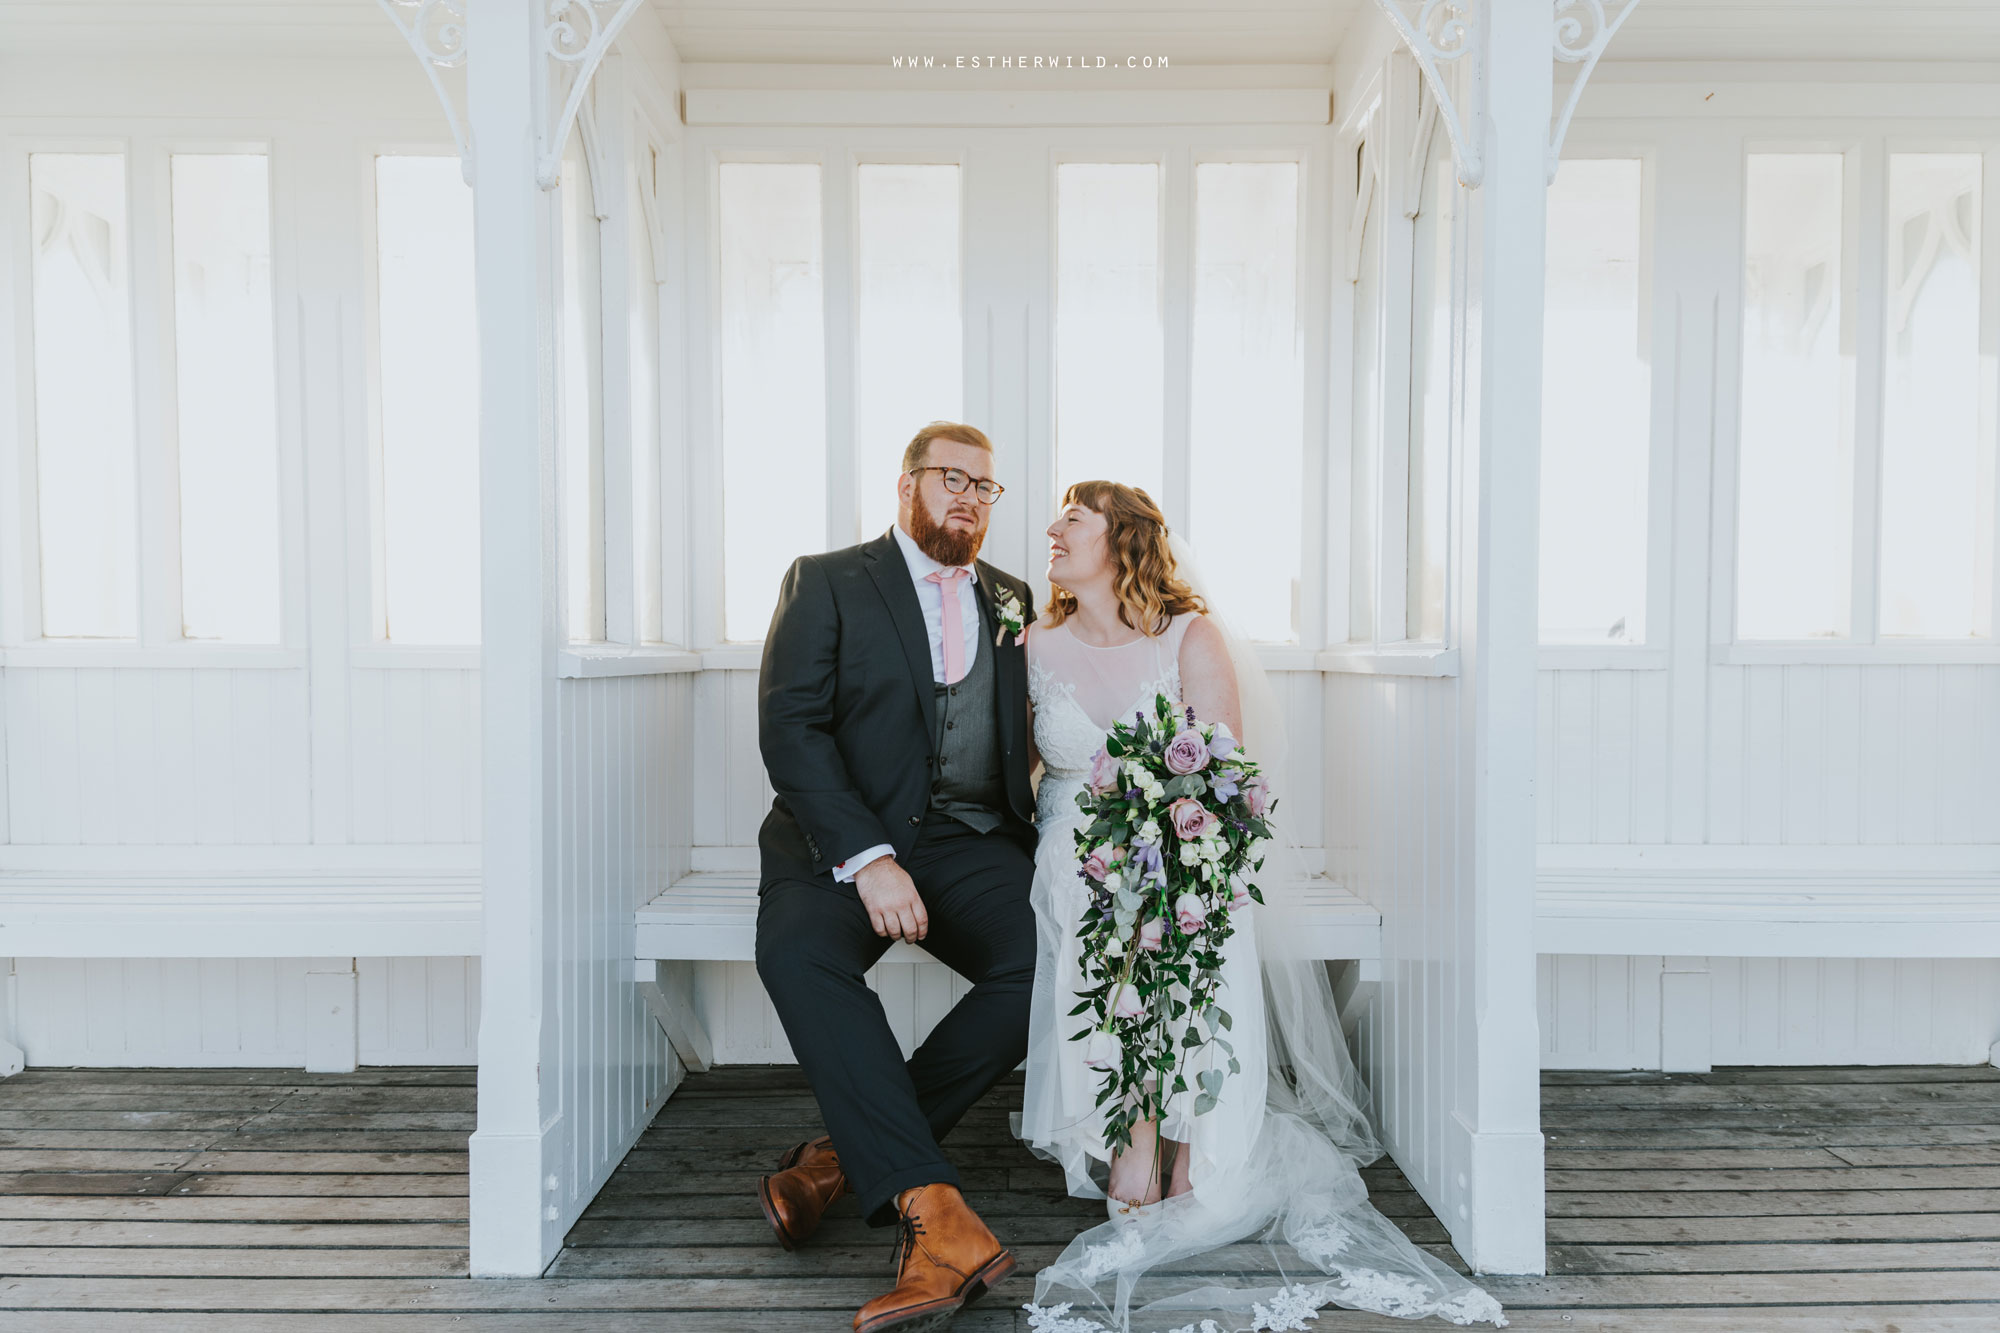 Cromer_Wedding_Beach_Outdoor_Ceremony_Norfolk_North_Lodge_Registry_Office_Rocket_House_Cafe_Cromer_Pier_IMG_4635.jpg